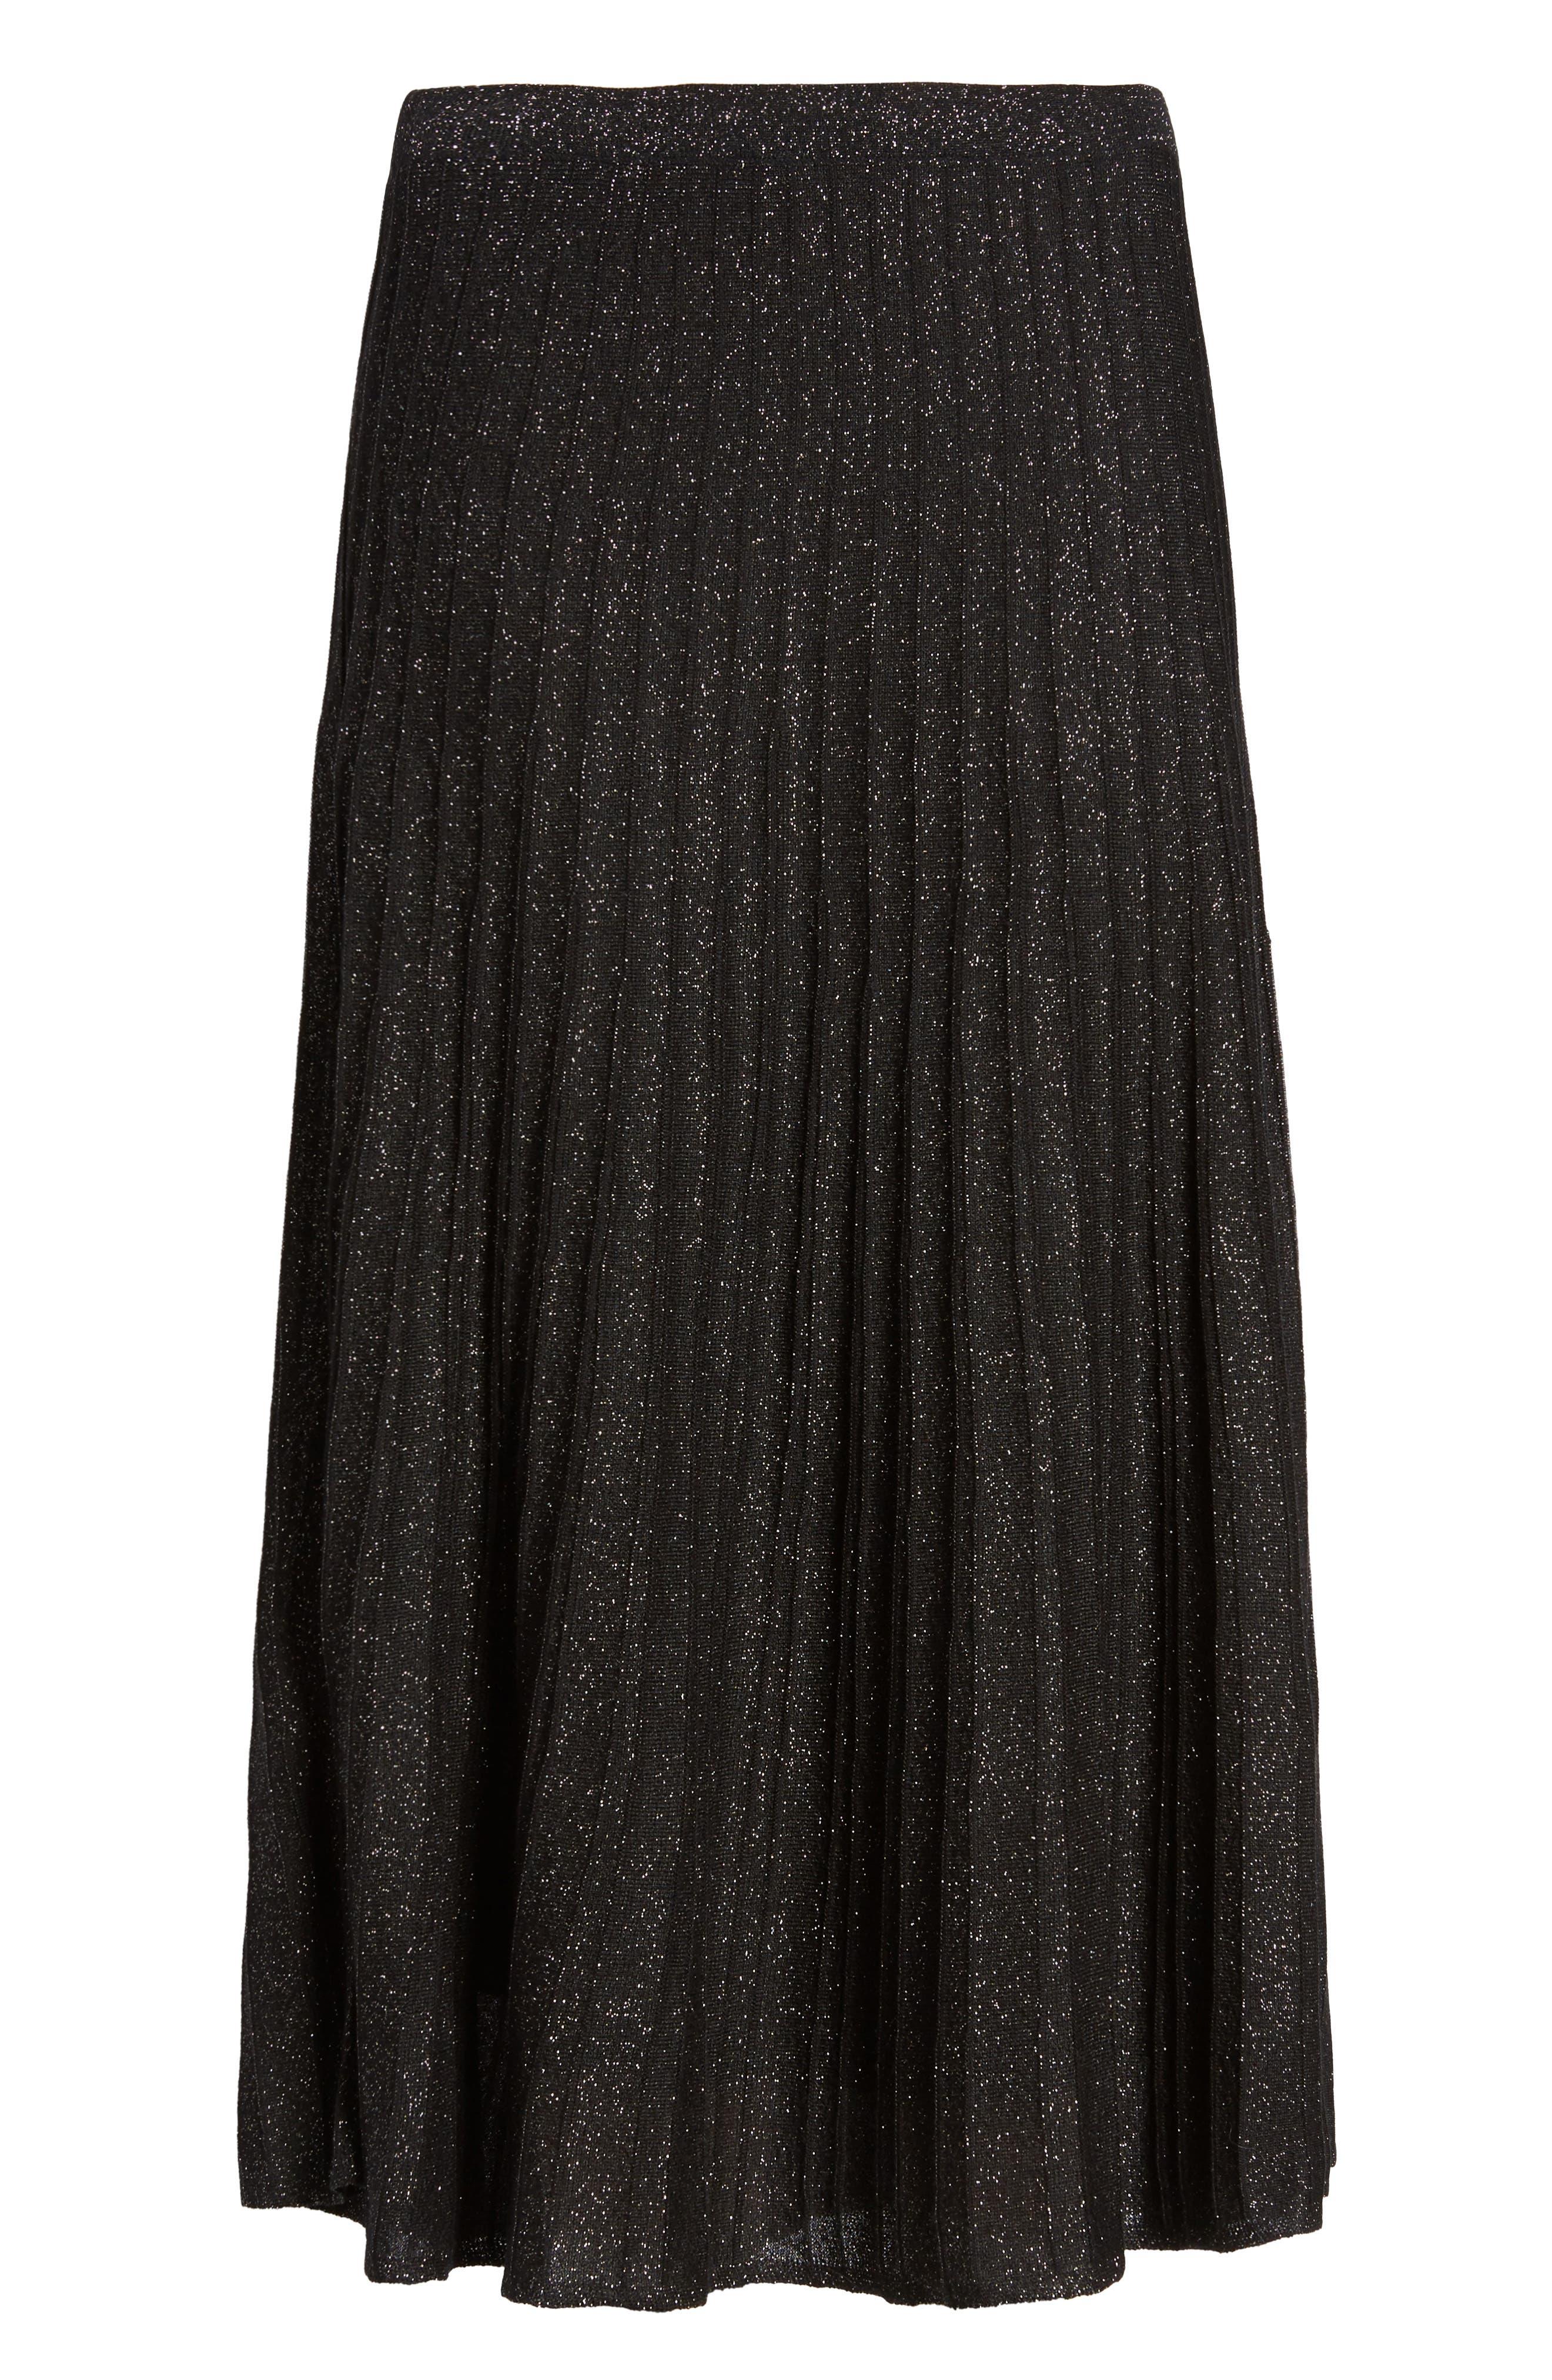 Luminary Pleated Midi Skirt,                             Alternate thumbnail 6, color,                             Black Mix